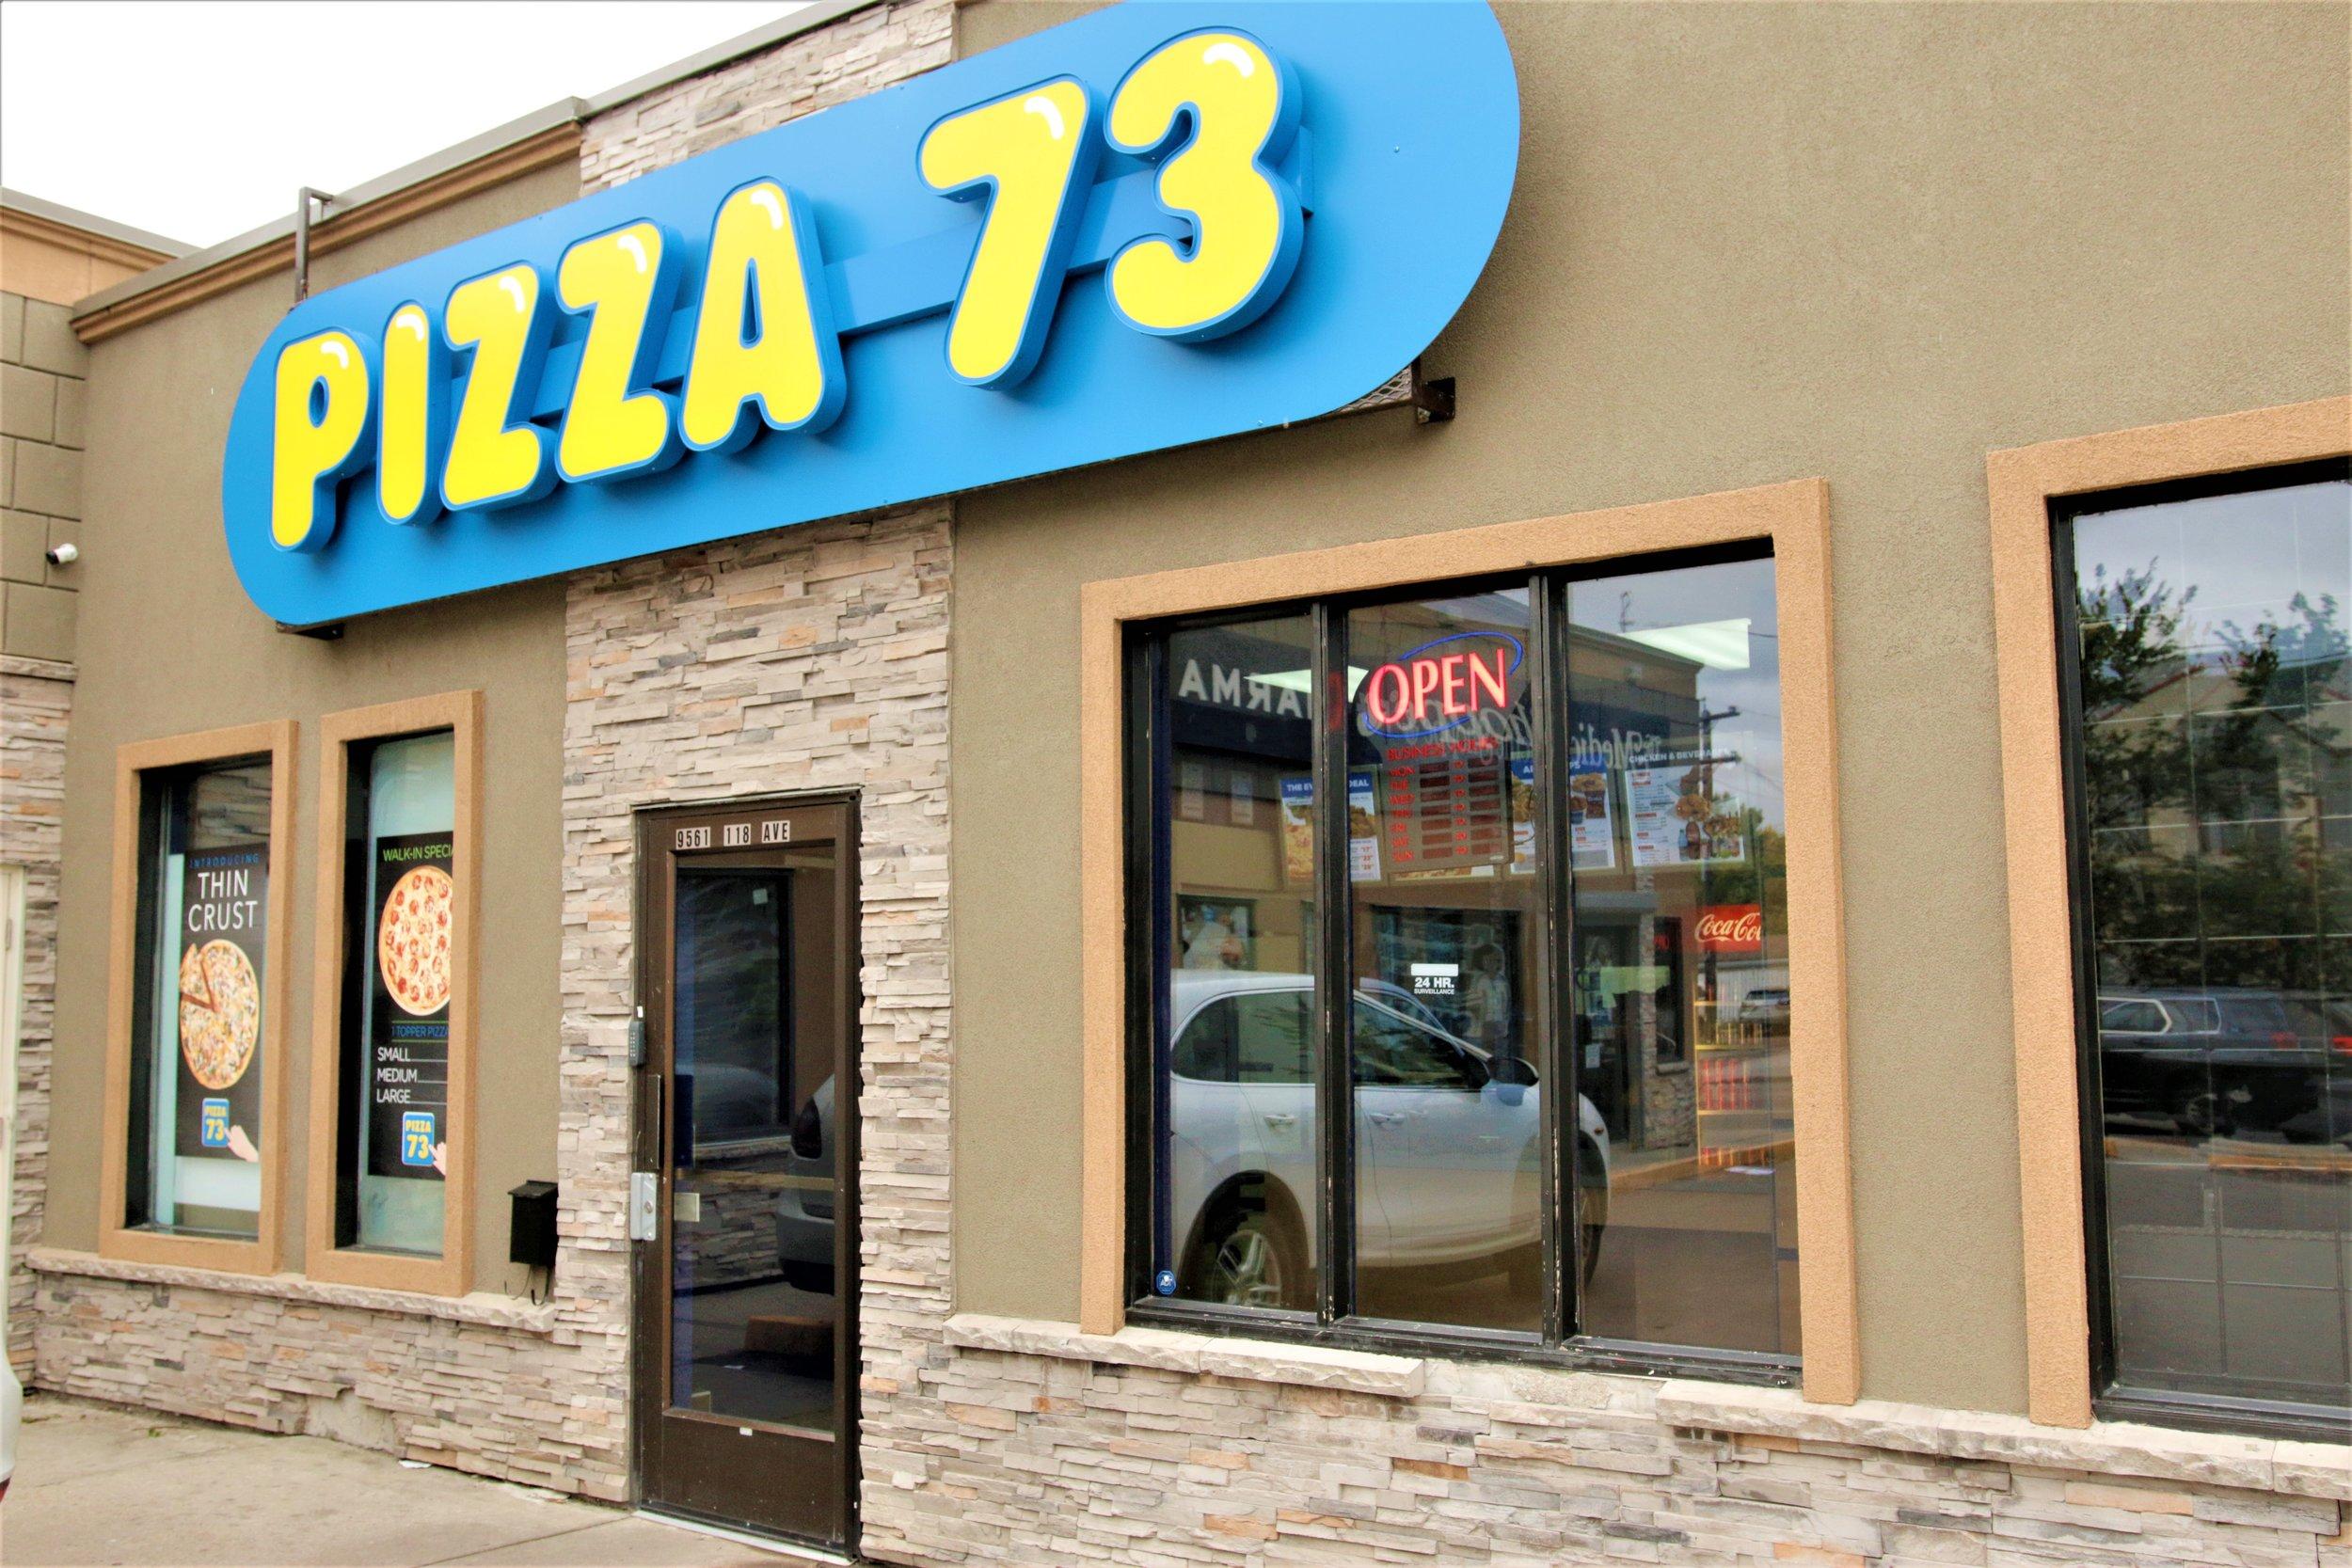 Pizza 73 2.JPG